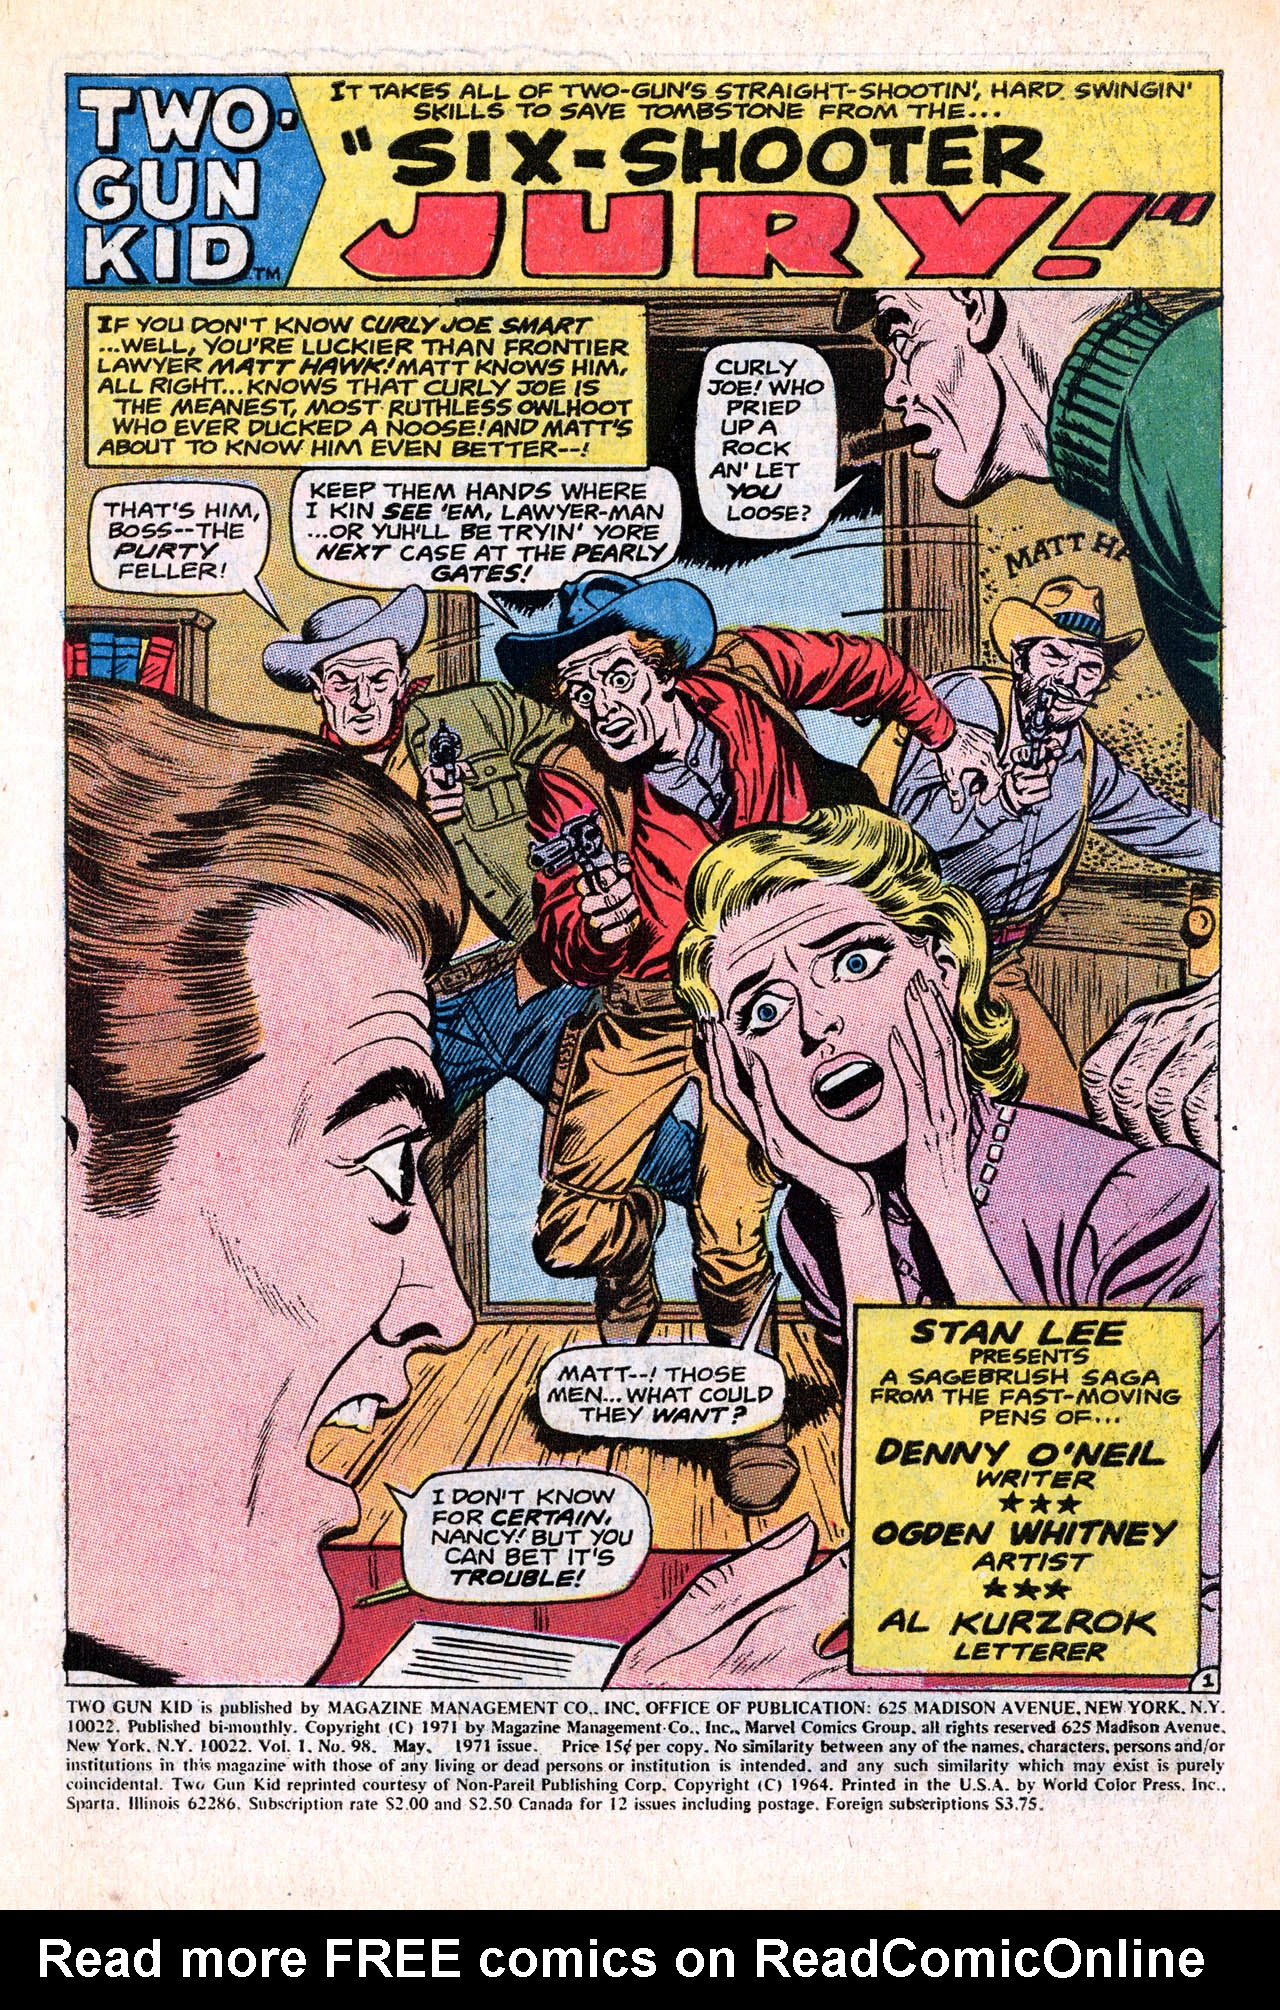 Read online Two-Gun Kid comic -  Issue #98 - 3